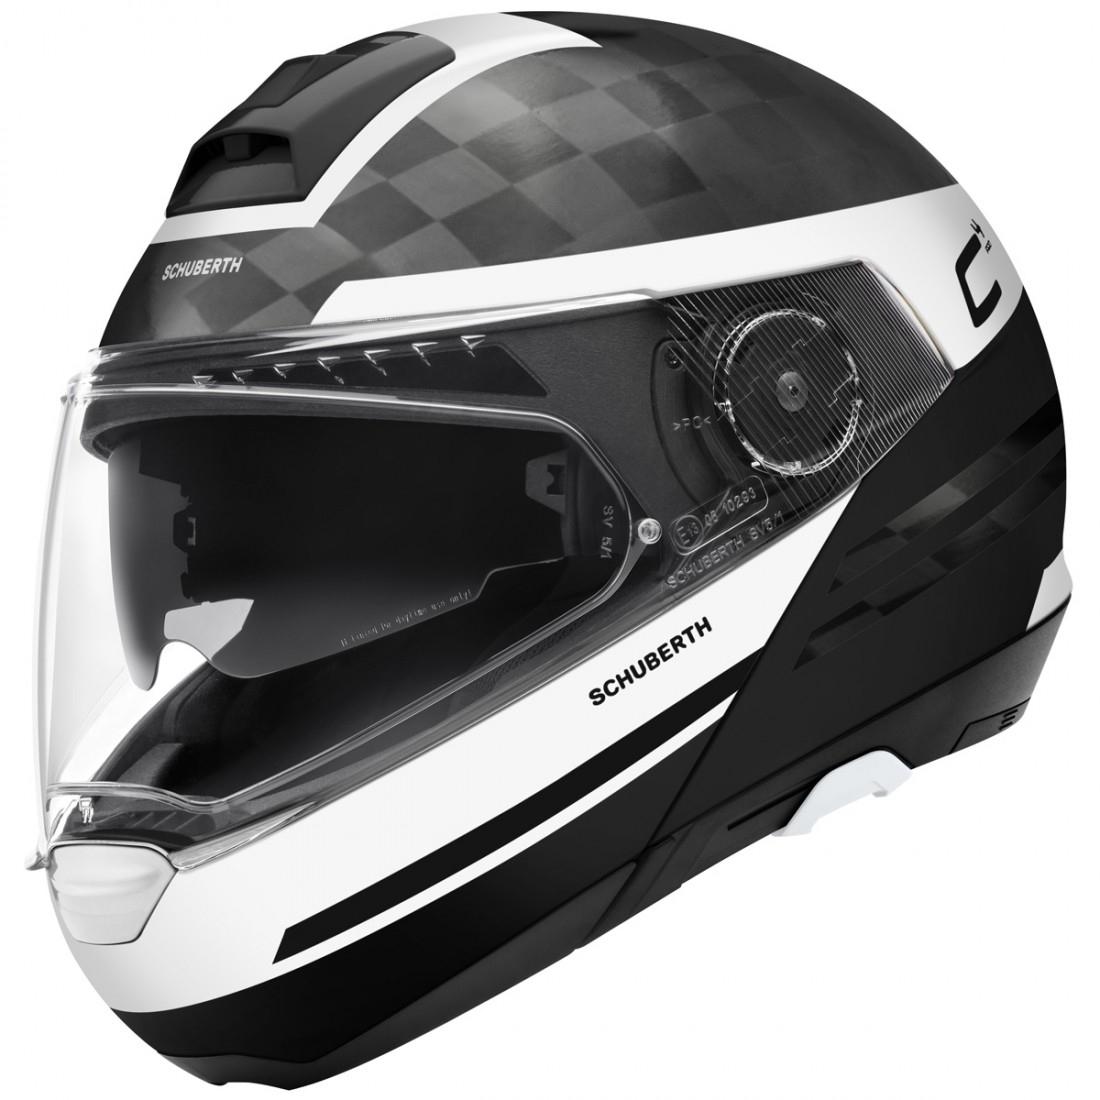 Helm Schuberth C4 Pro Carbon Tempest White